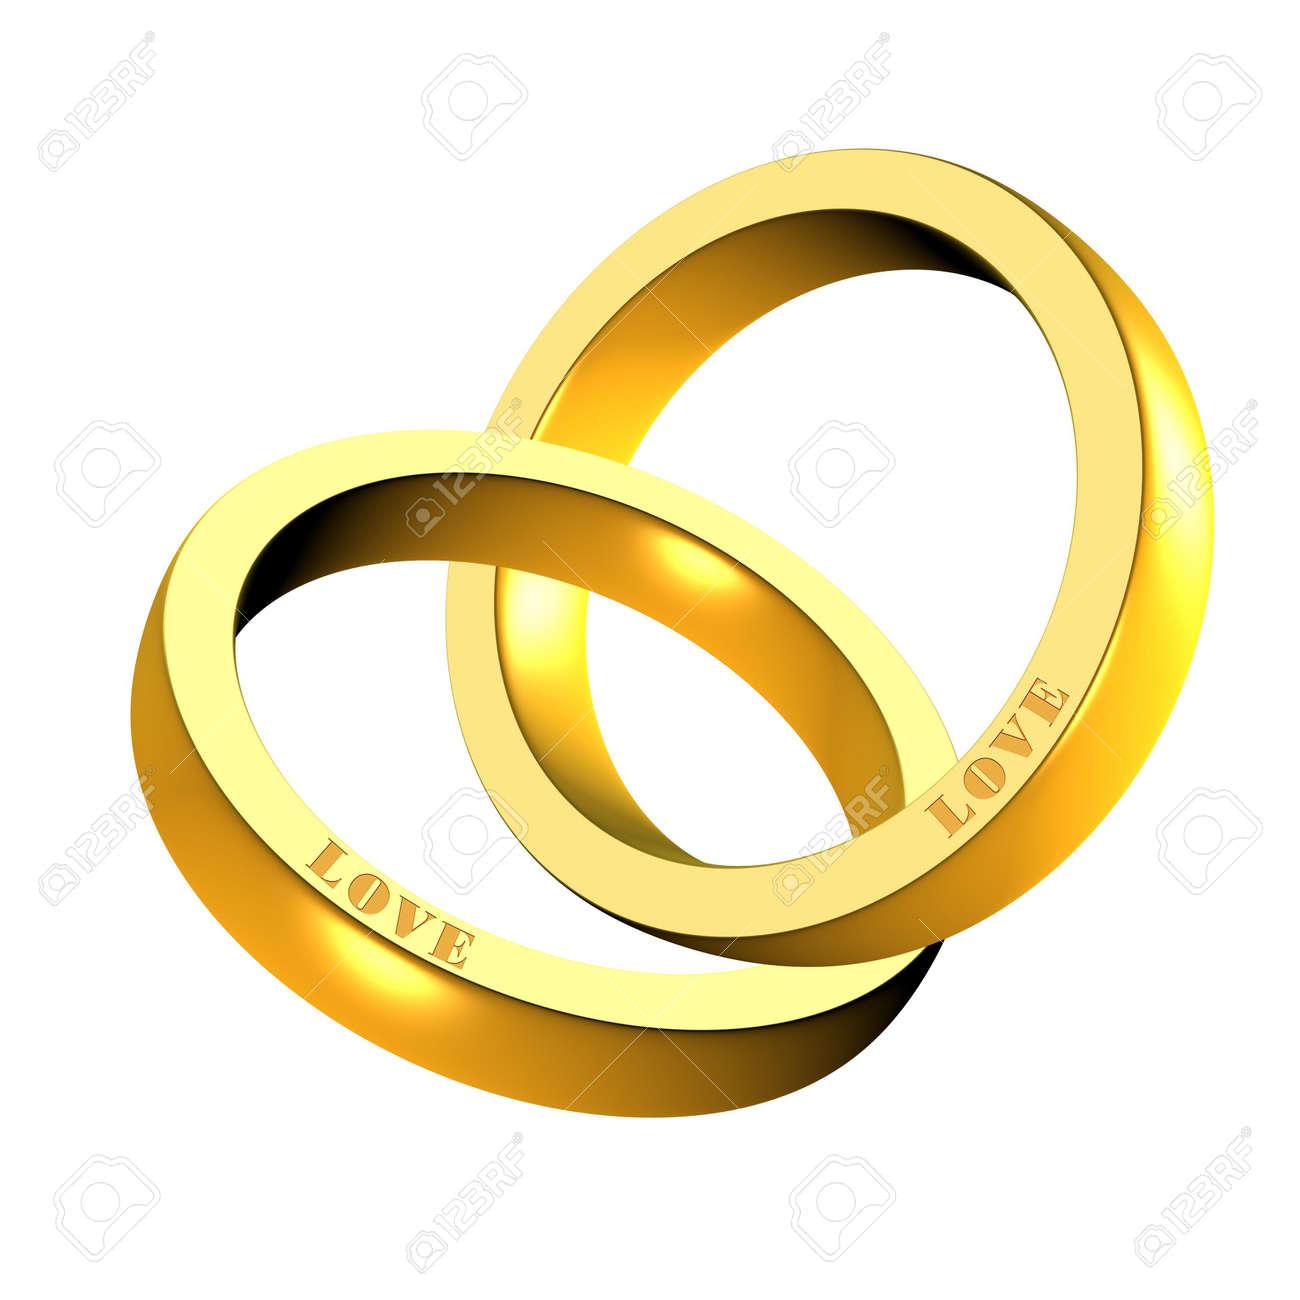 An illustration of 3d shiny golden rings Stock Photo - 9141821